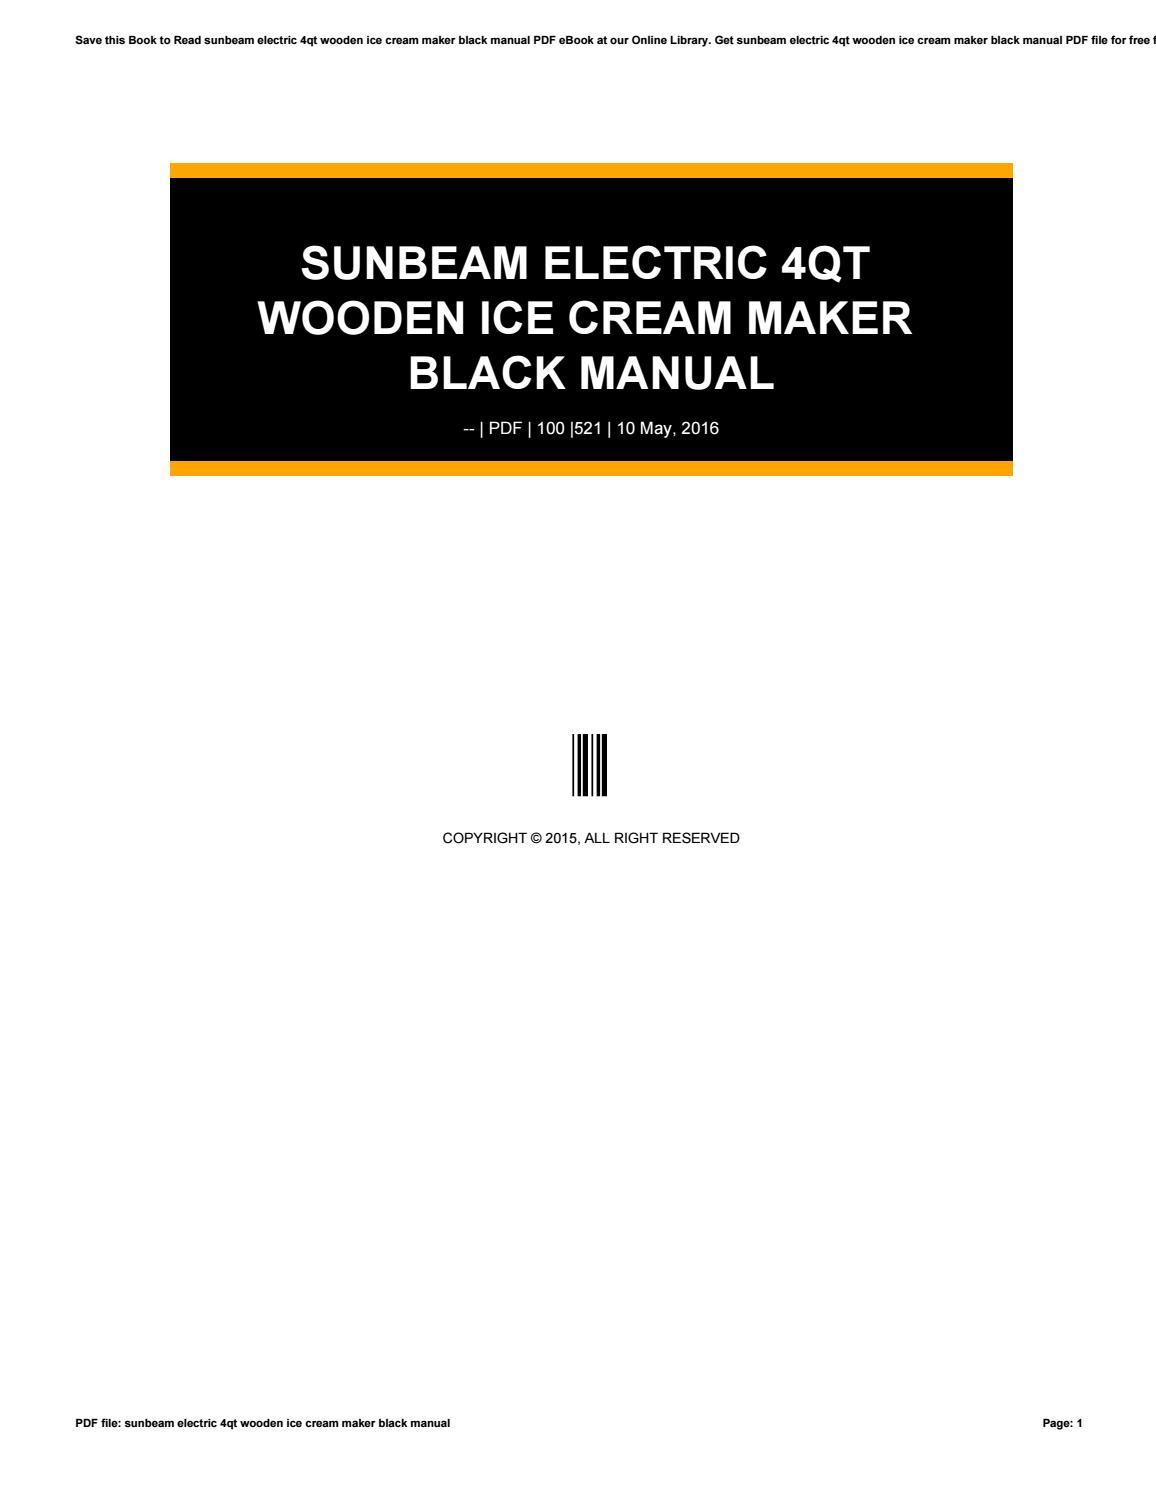 Sunbeam electric 4qt wooden ice cream maker black manual by rkomo39 - issuu